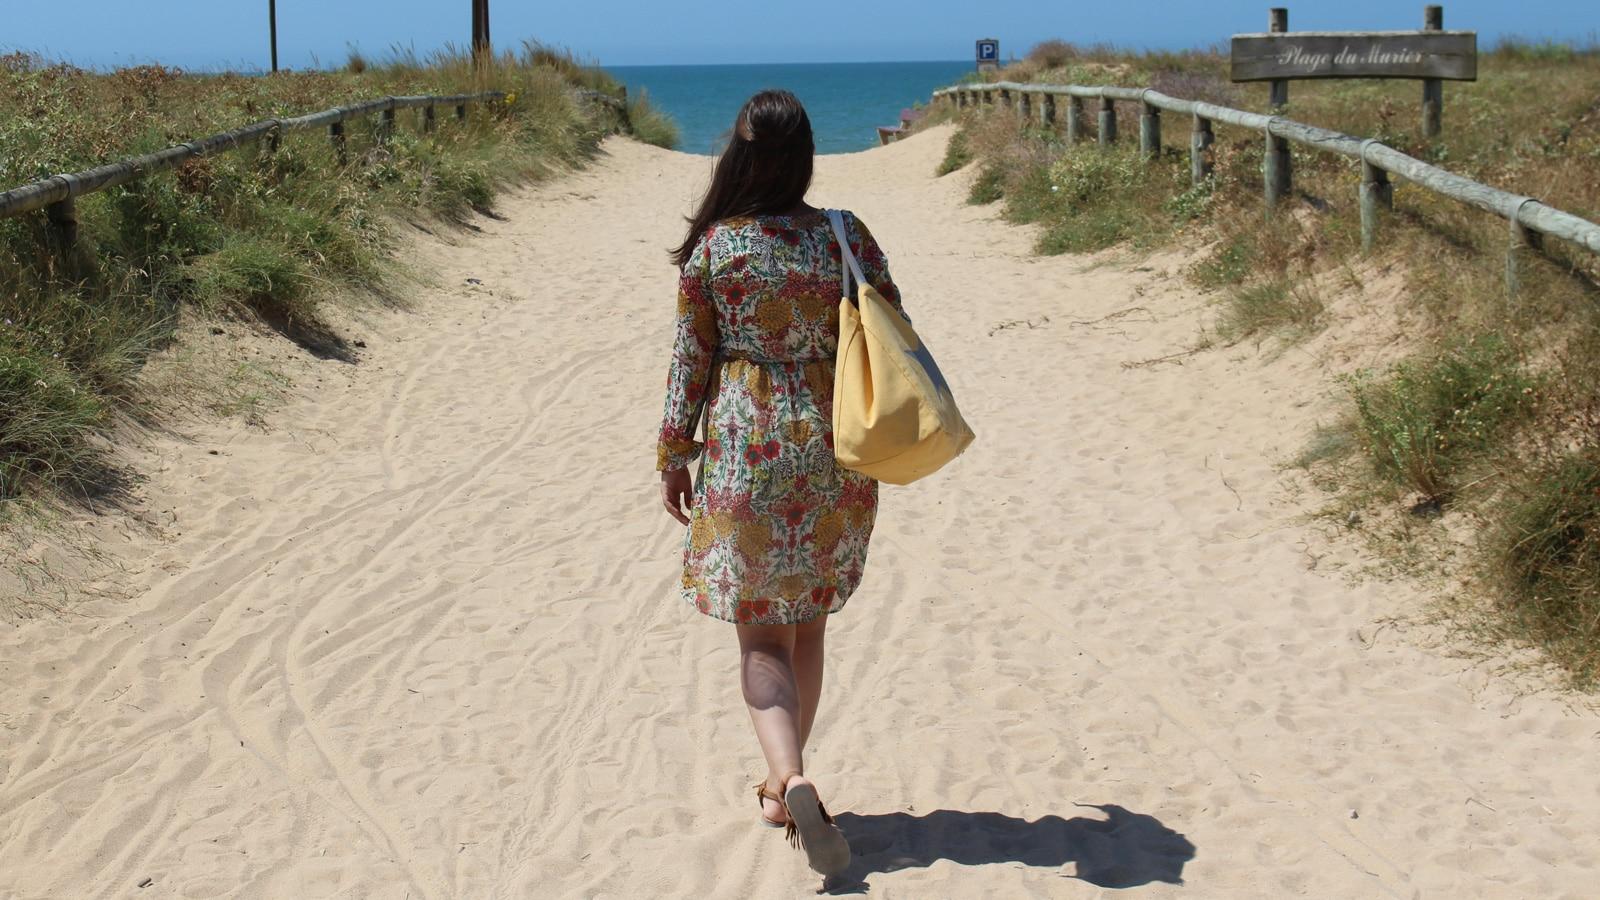 plage-du-murier-femme2-EMMANUELLE-MARCADE-notredamedemonts